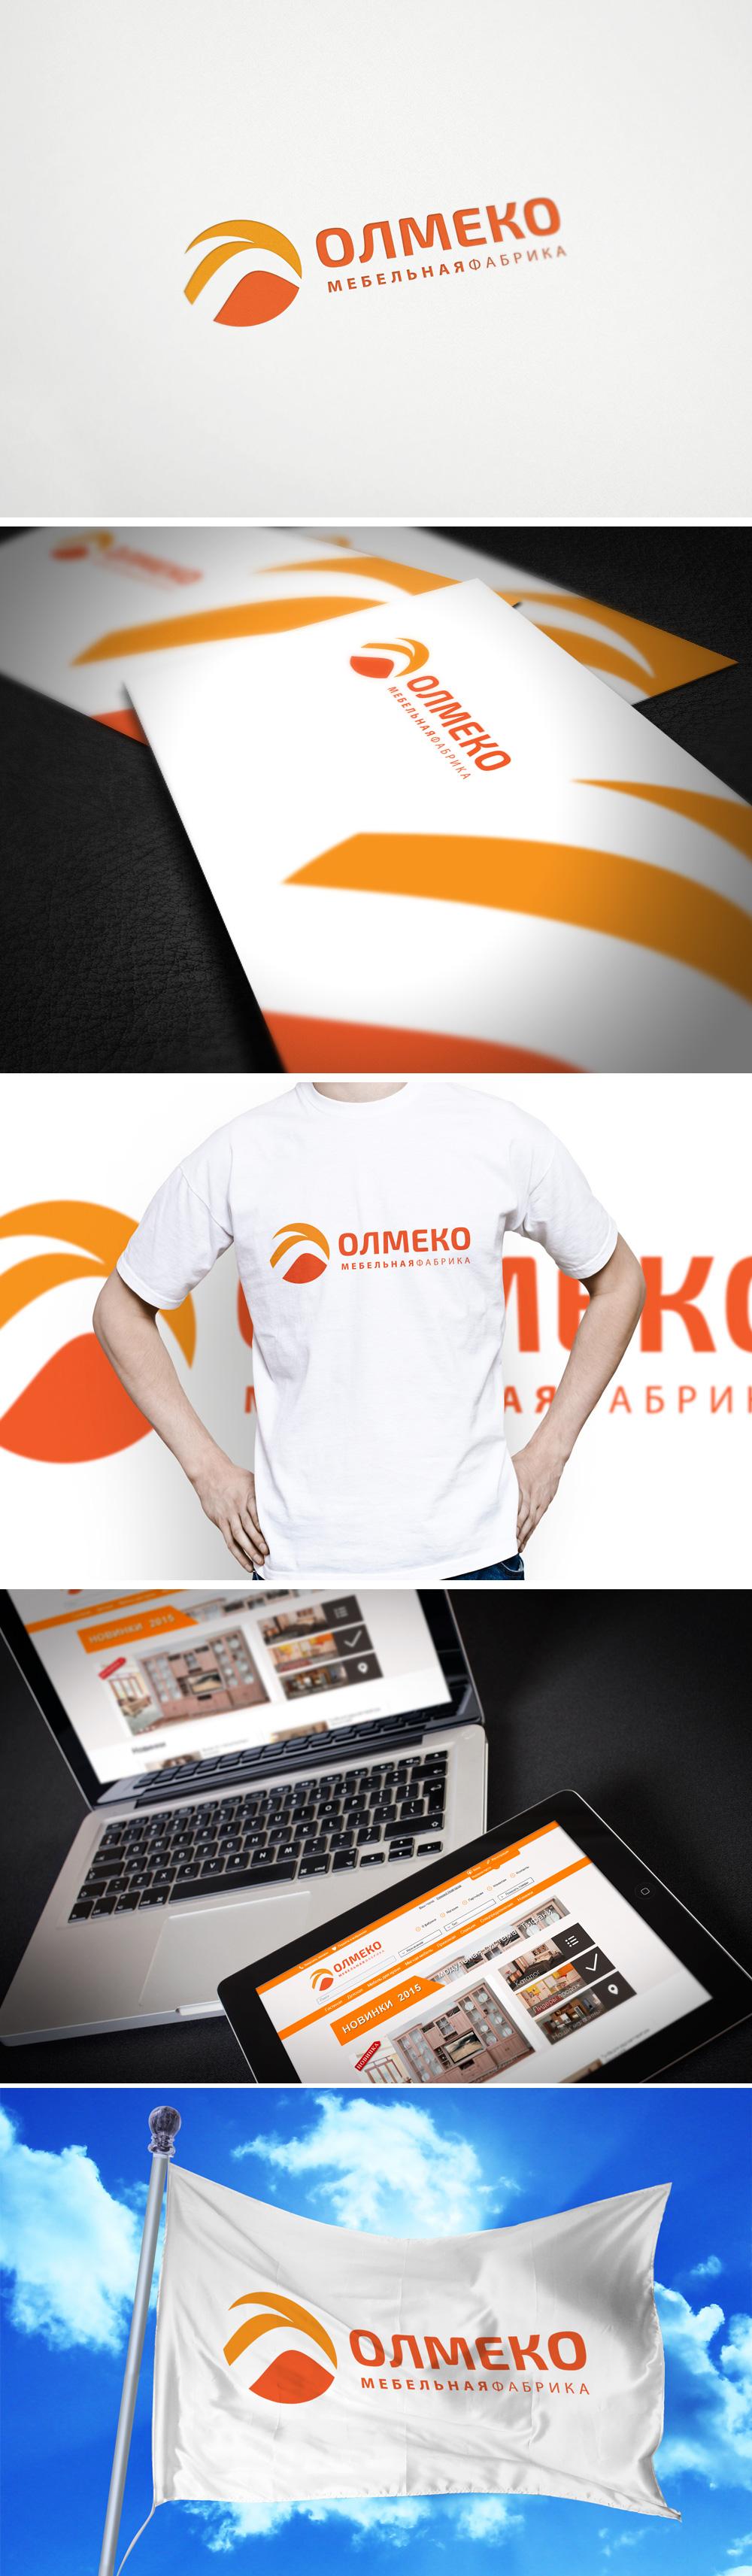 Ребрендинг/Редизайн логотипа Мебельной Фабрики фото f_70755118e770f83e.jpg